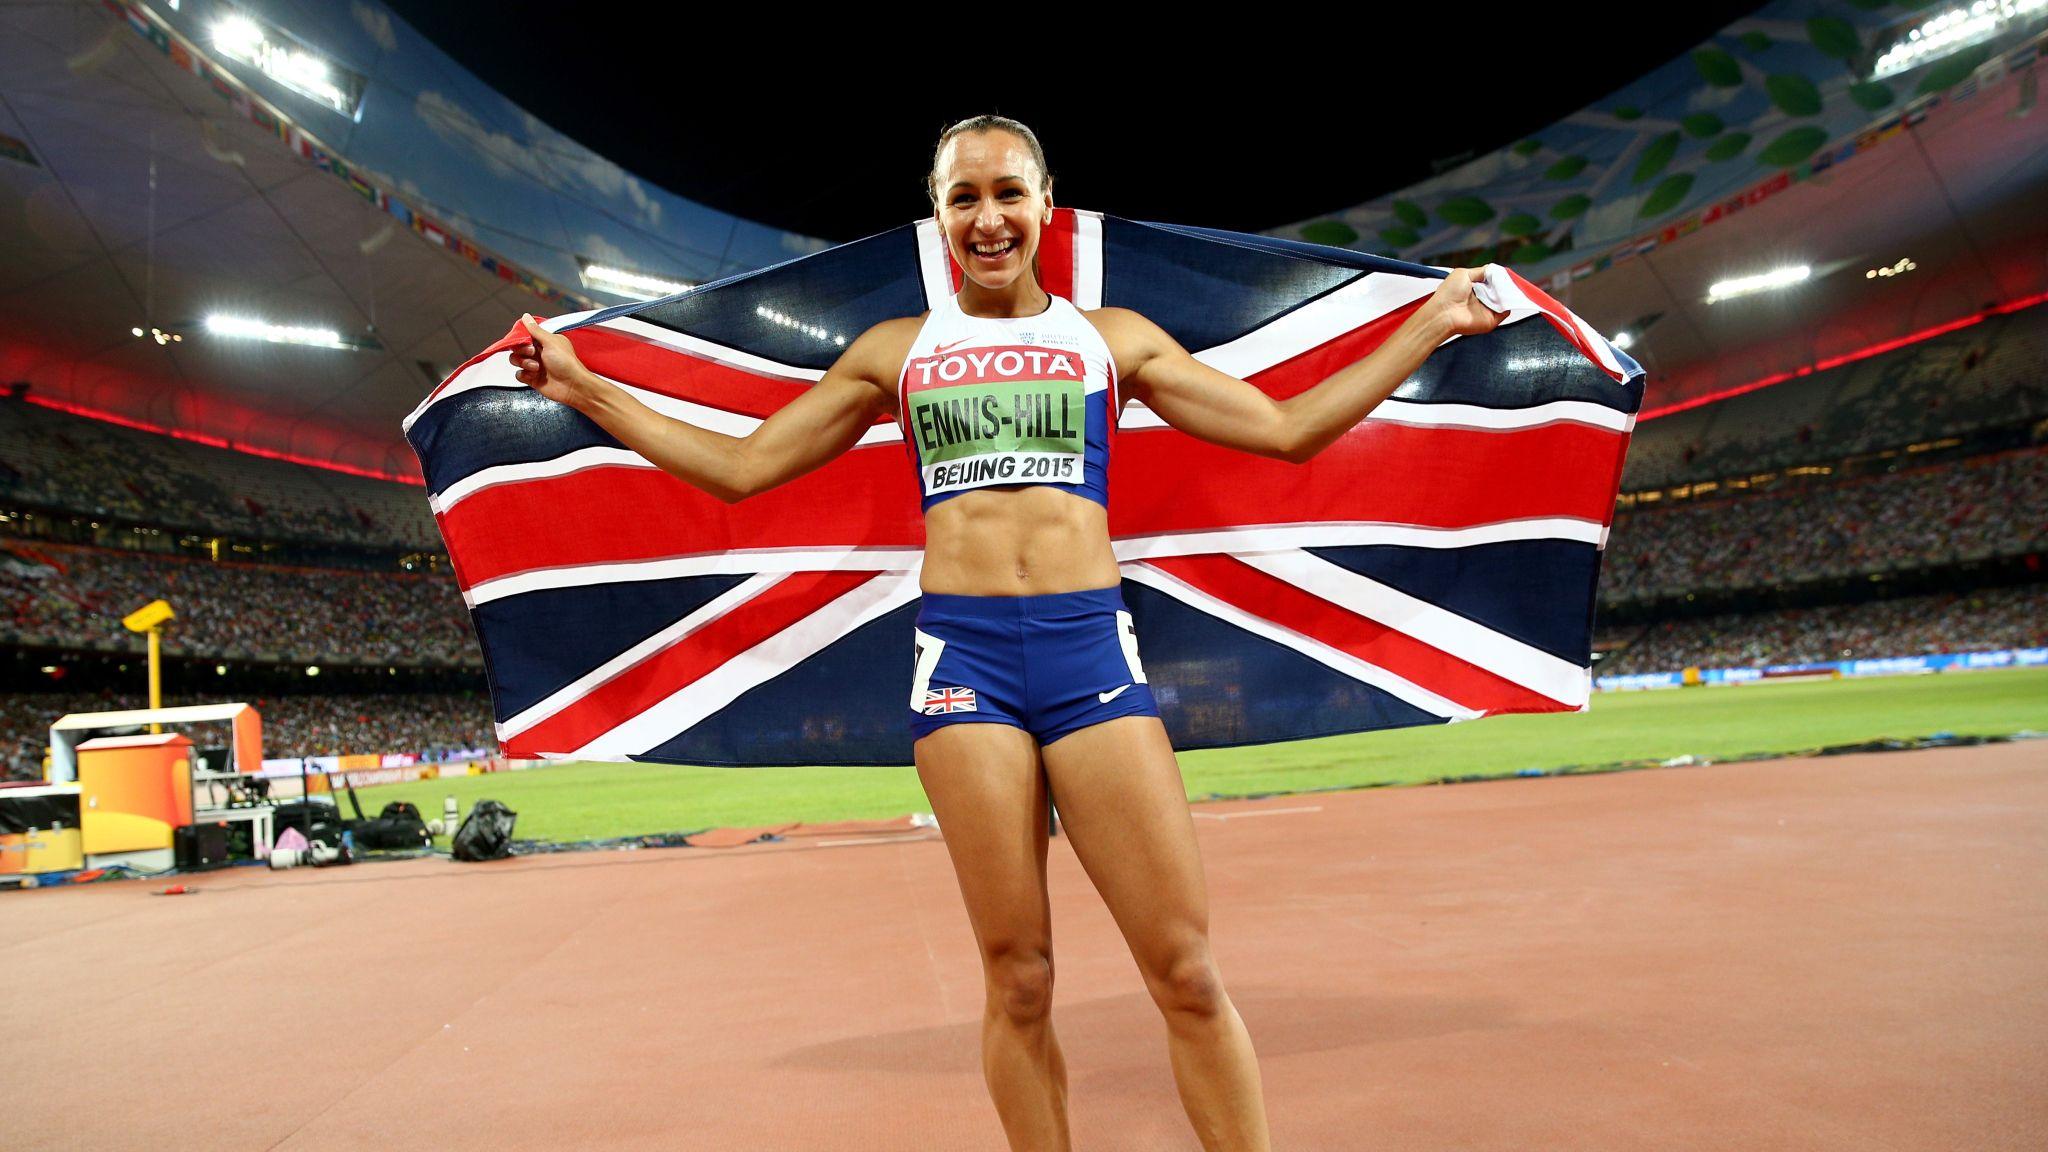 Jessica Ennis-Hill wins heptathlon gold at World